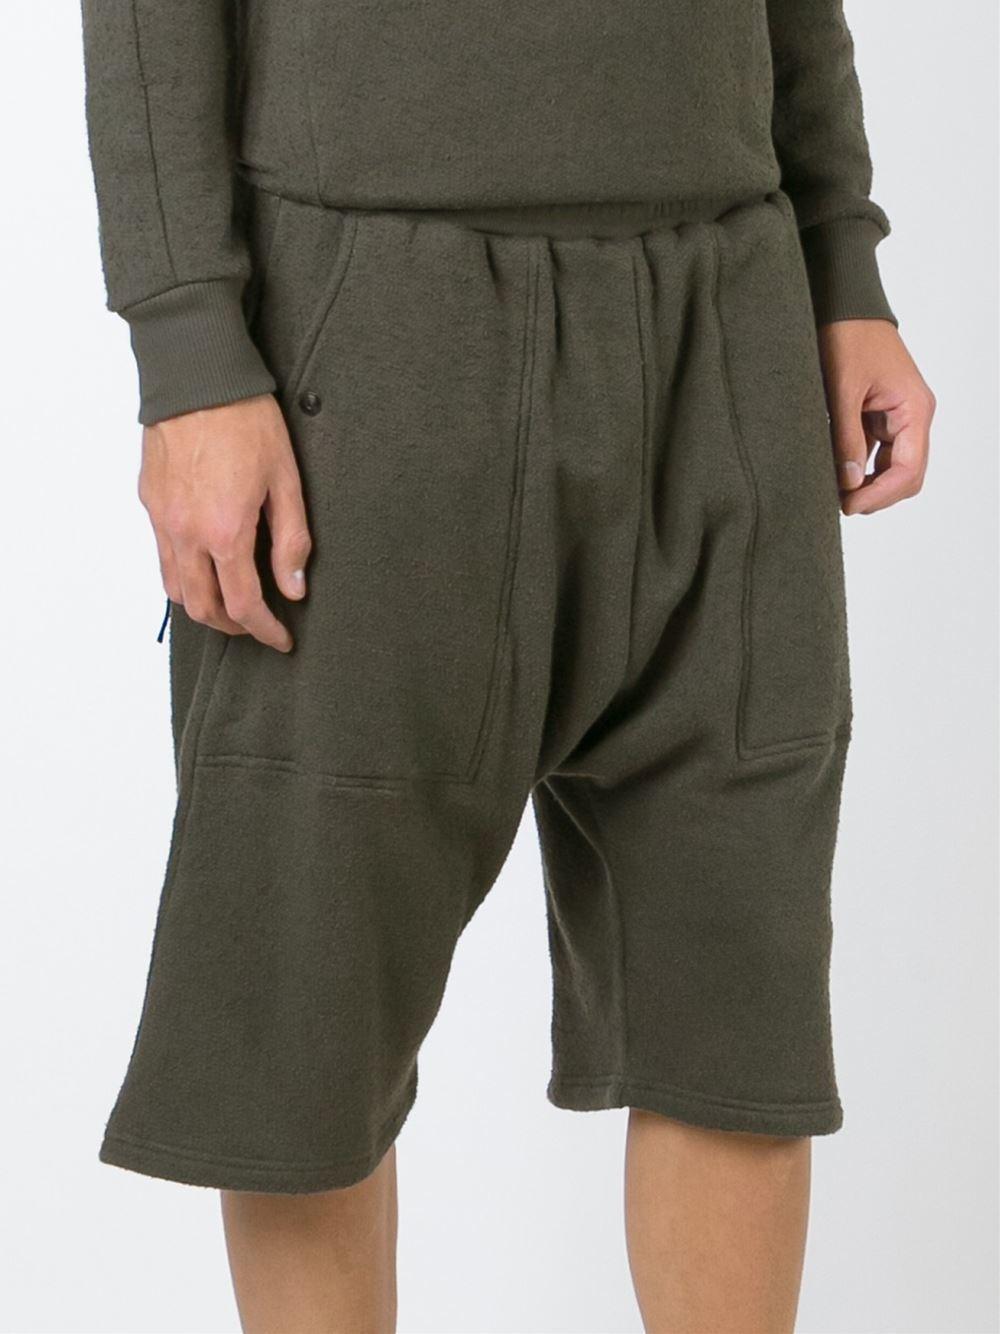 Pantalon - Bermudas Damir Doma De hT07SyWddK